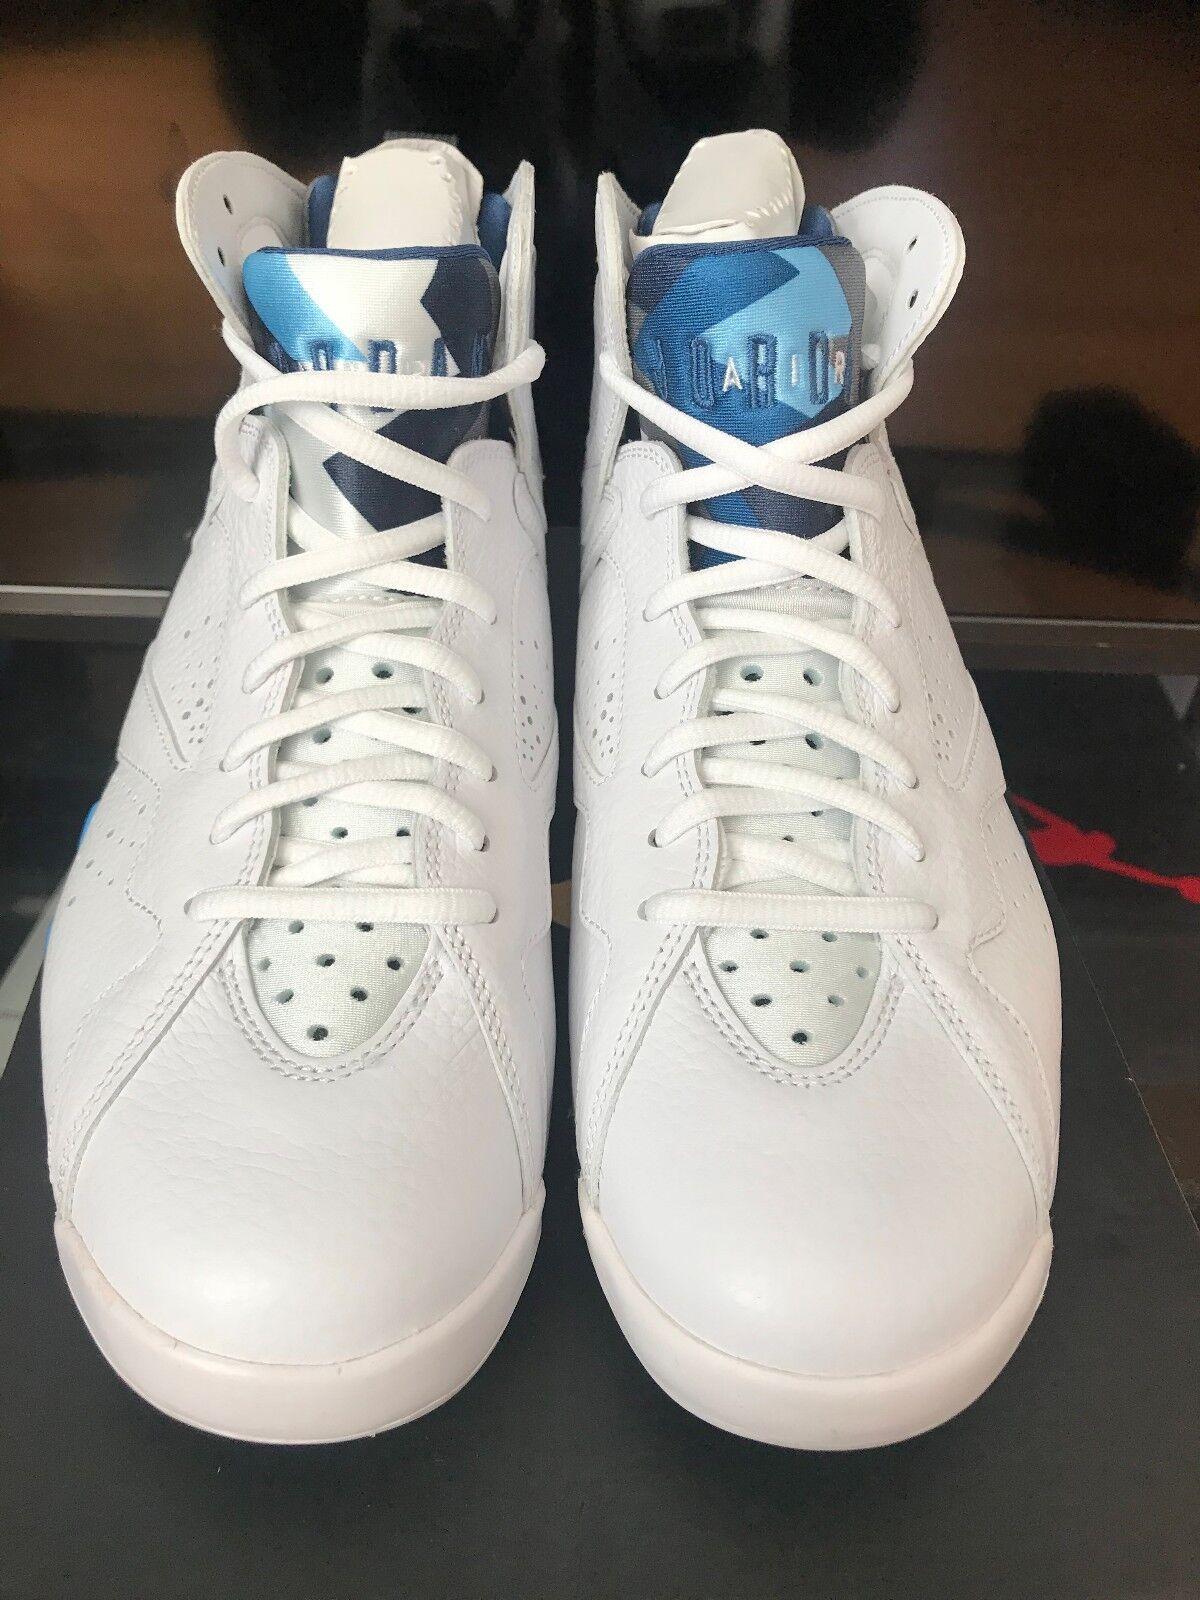 New Mens Nike Air Jordan Retro 7 VII 304775-107 White French Blue UNC Size 8